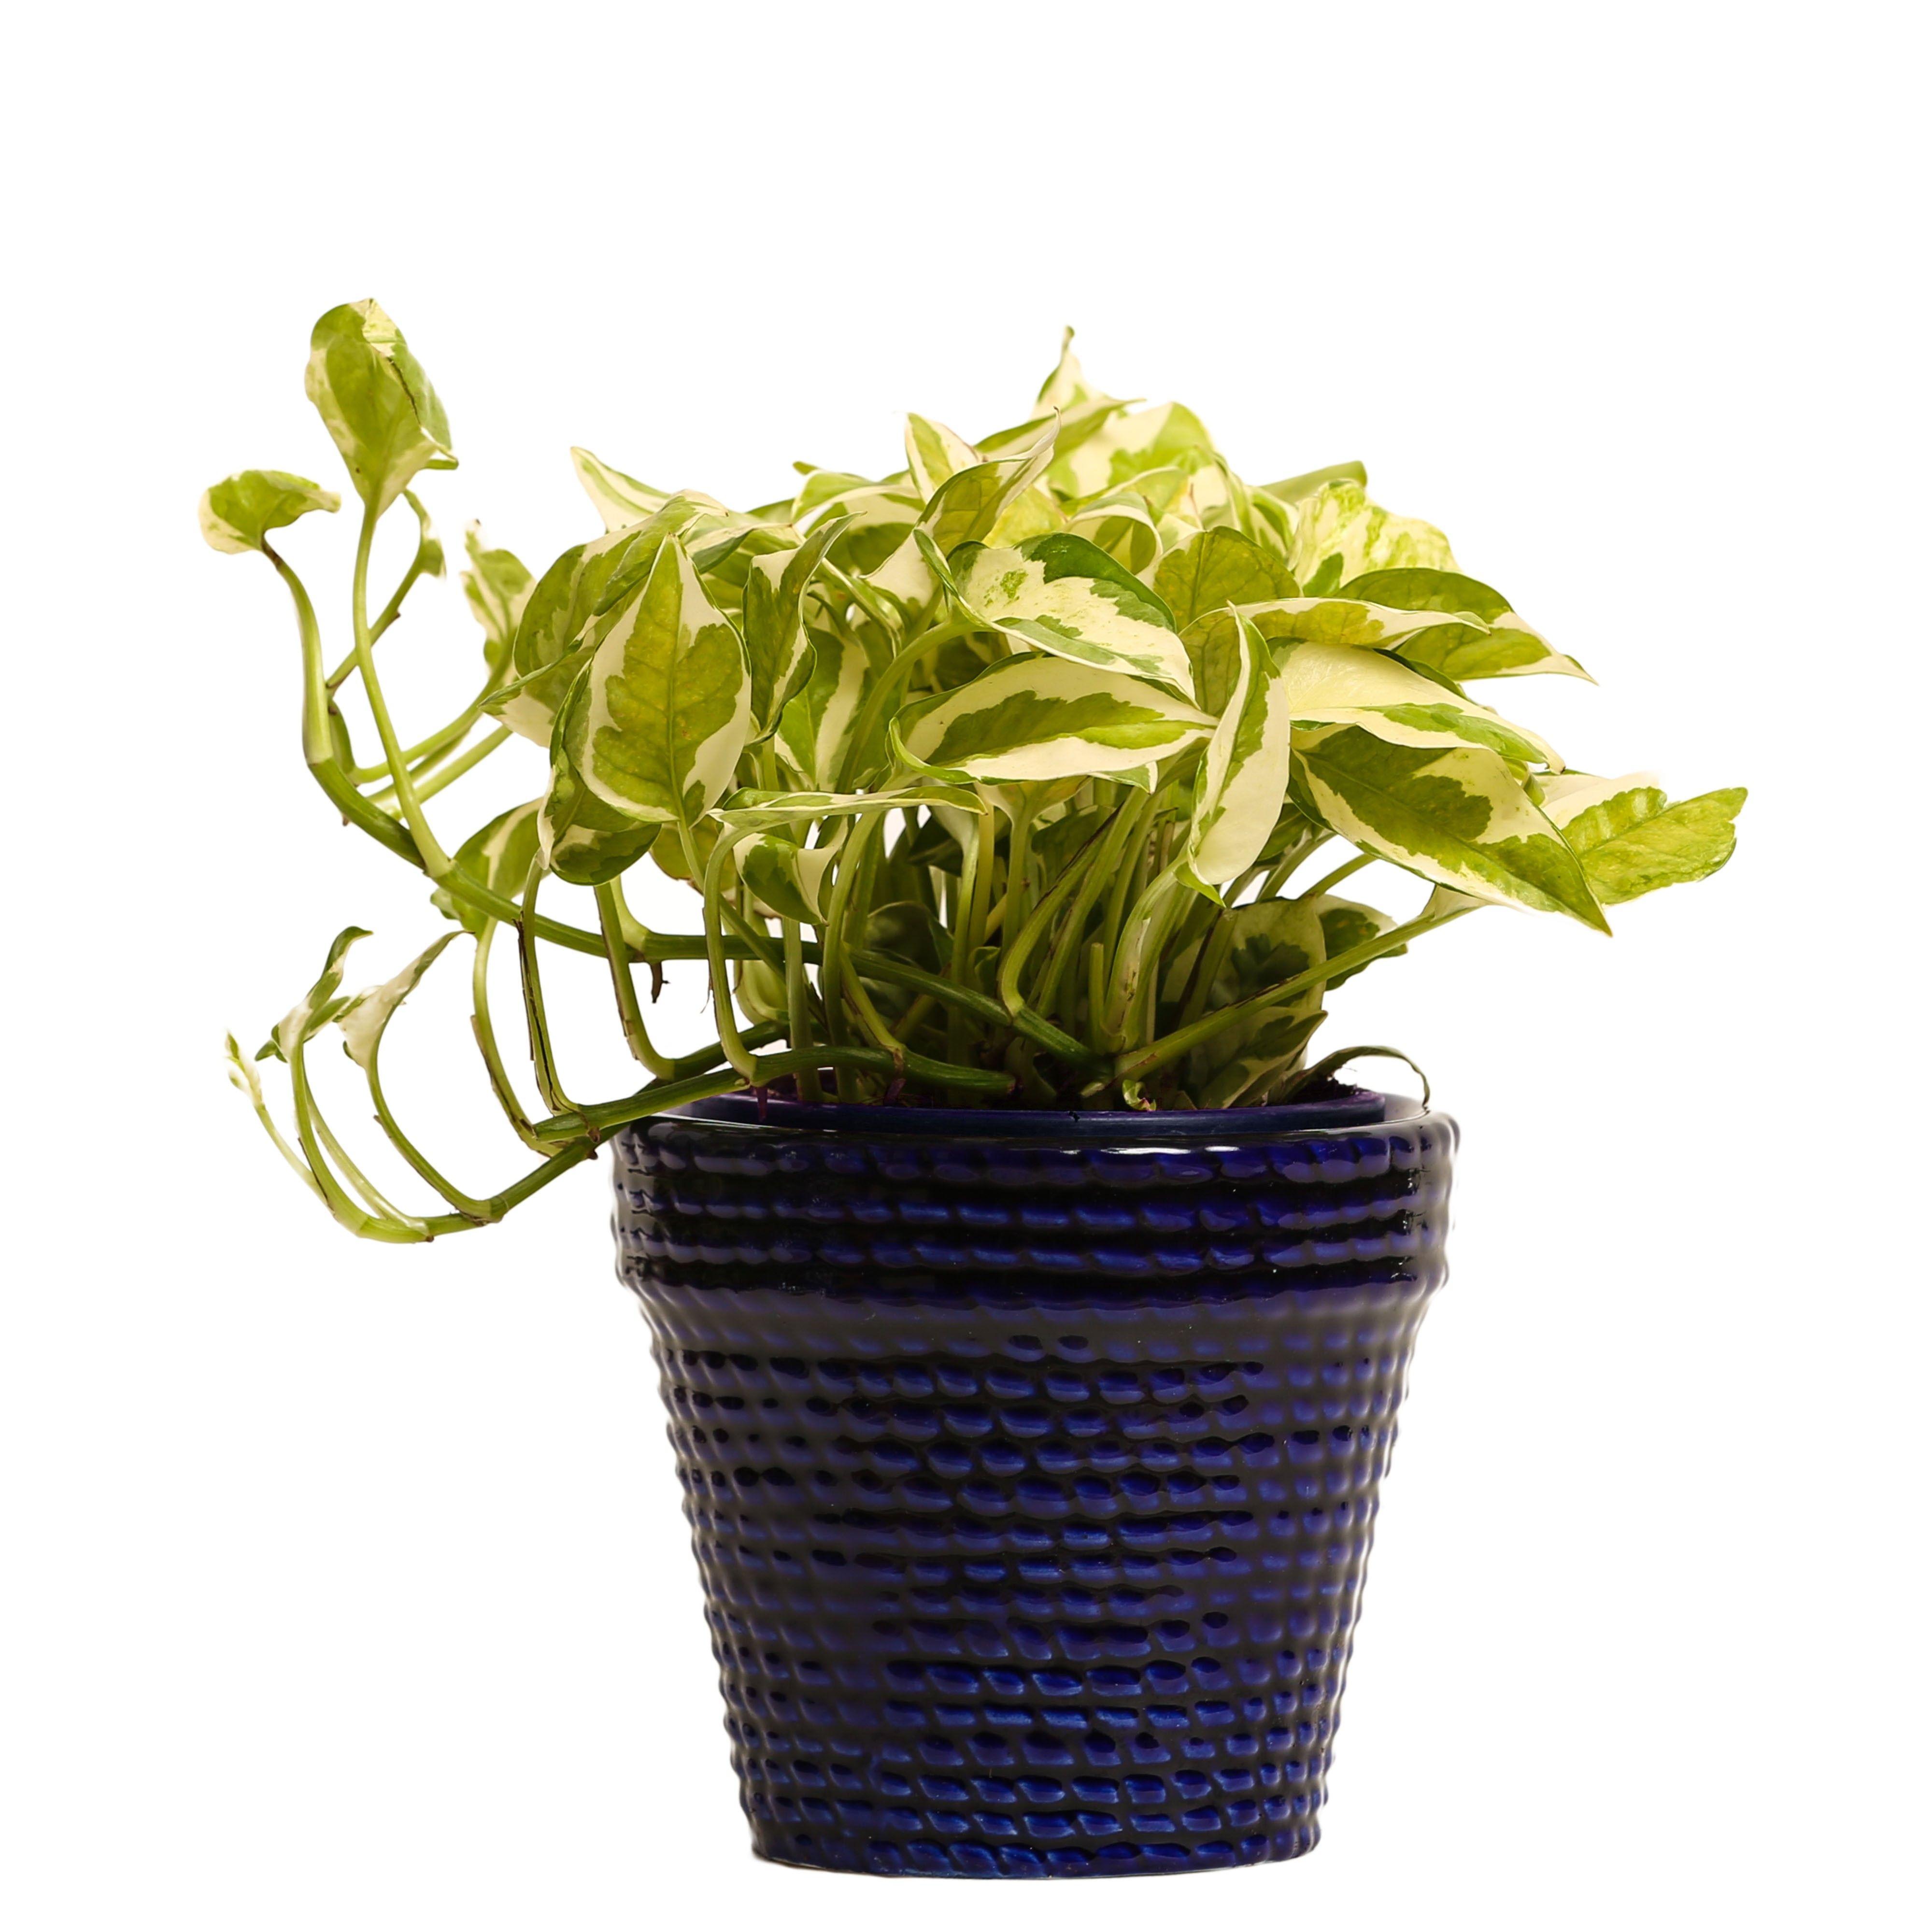 NG- Indoor Plant White Pothos Blue Ceramic Pot